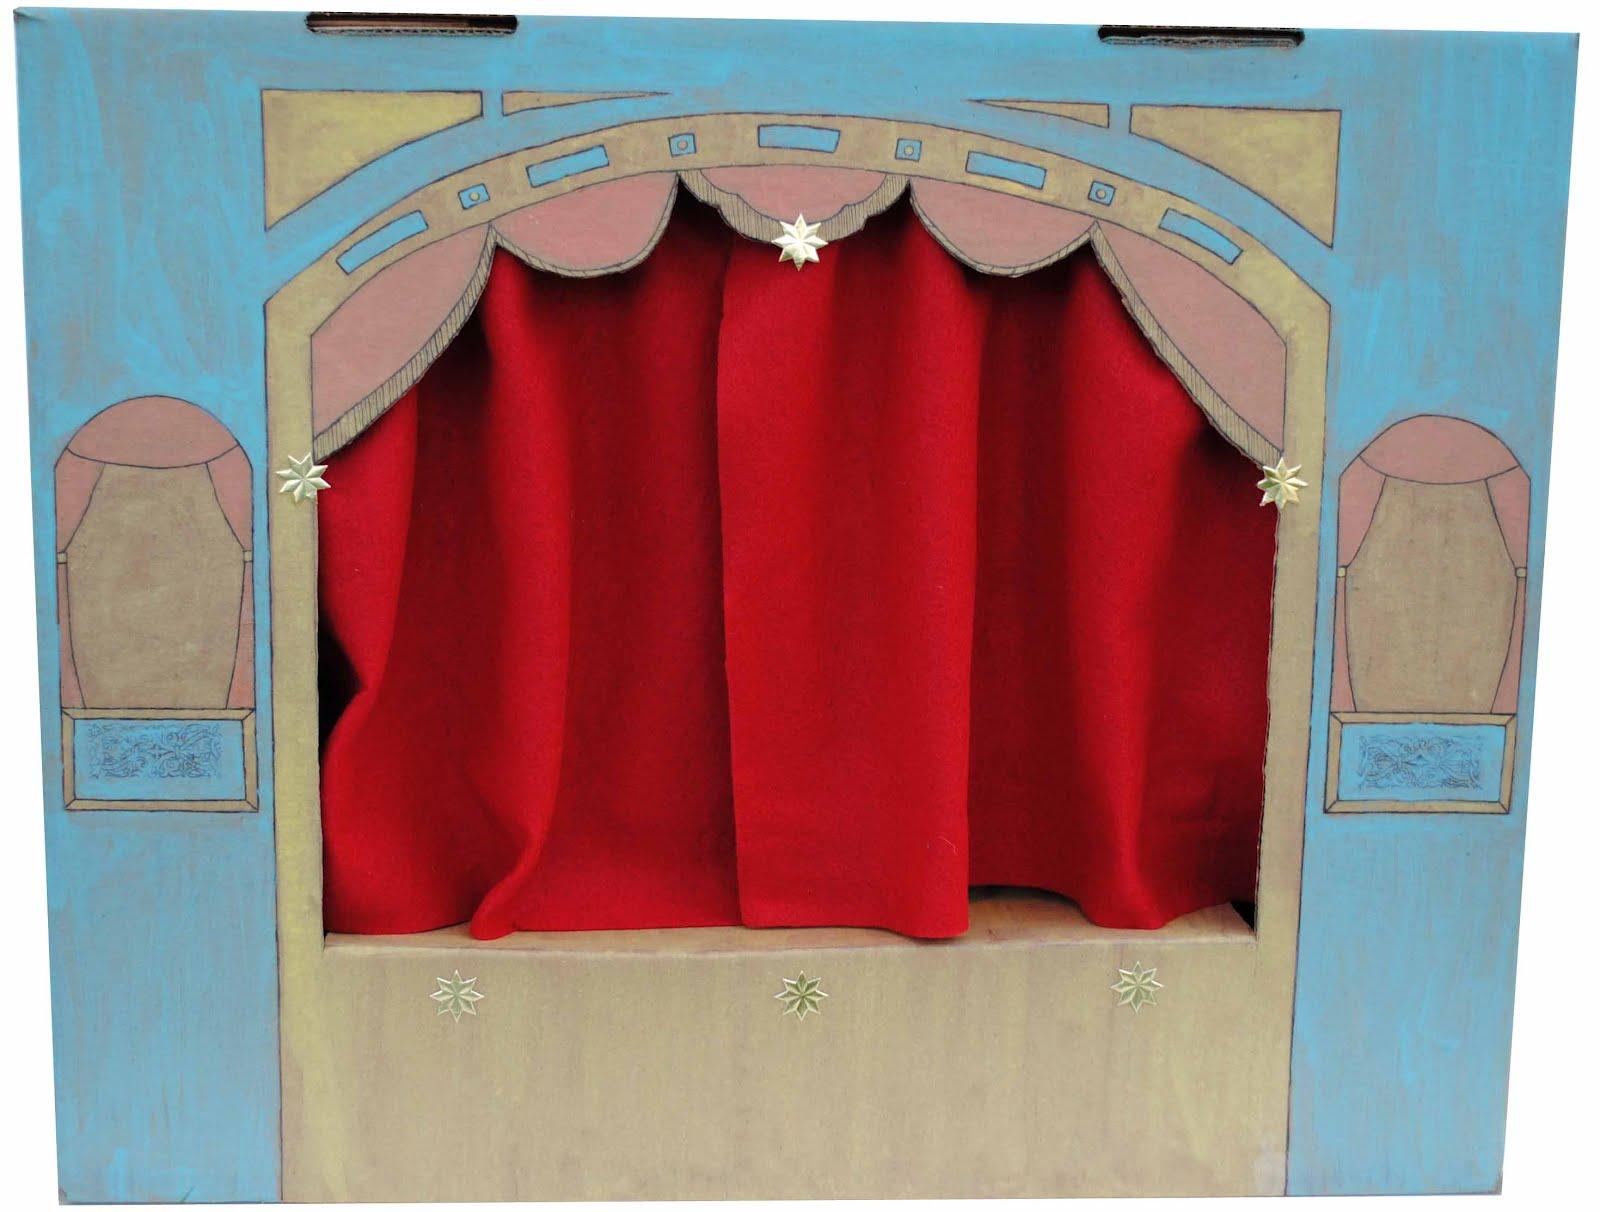 Zakka Life Craft Cardboard Puppet Theater